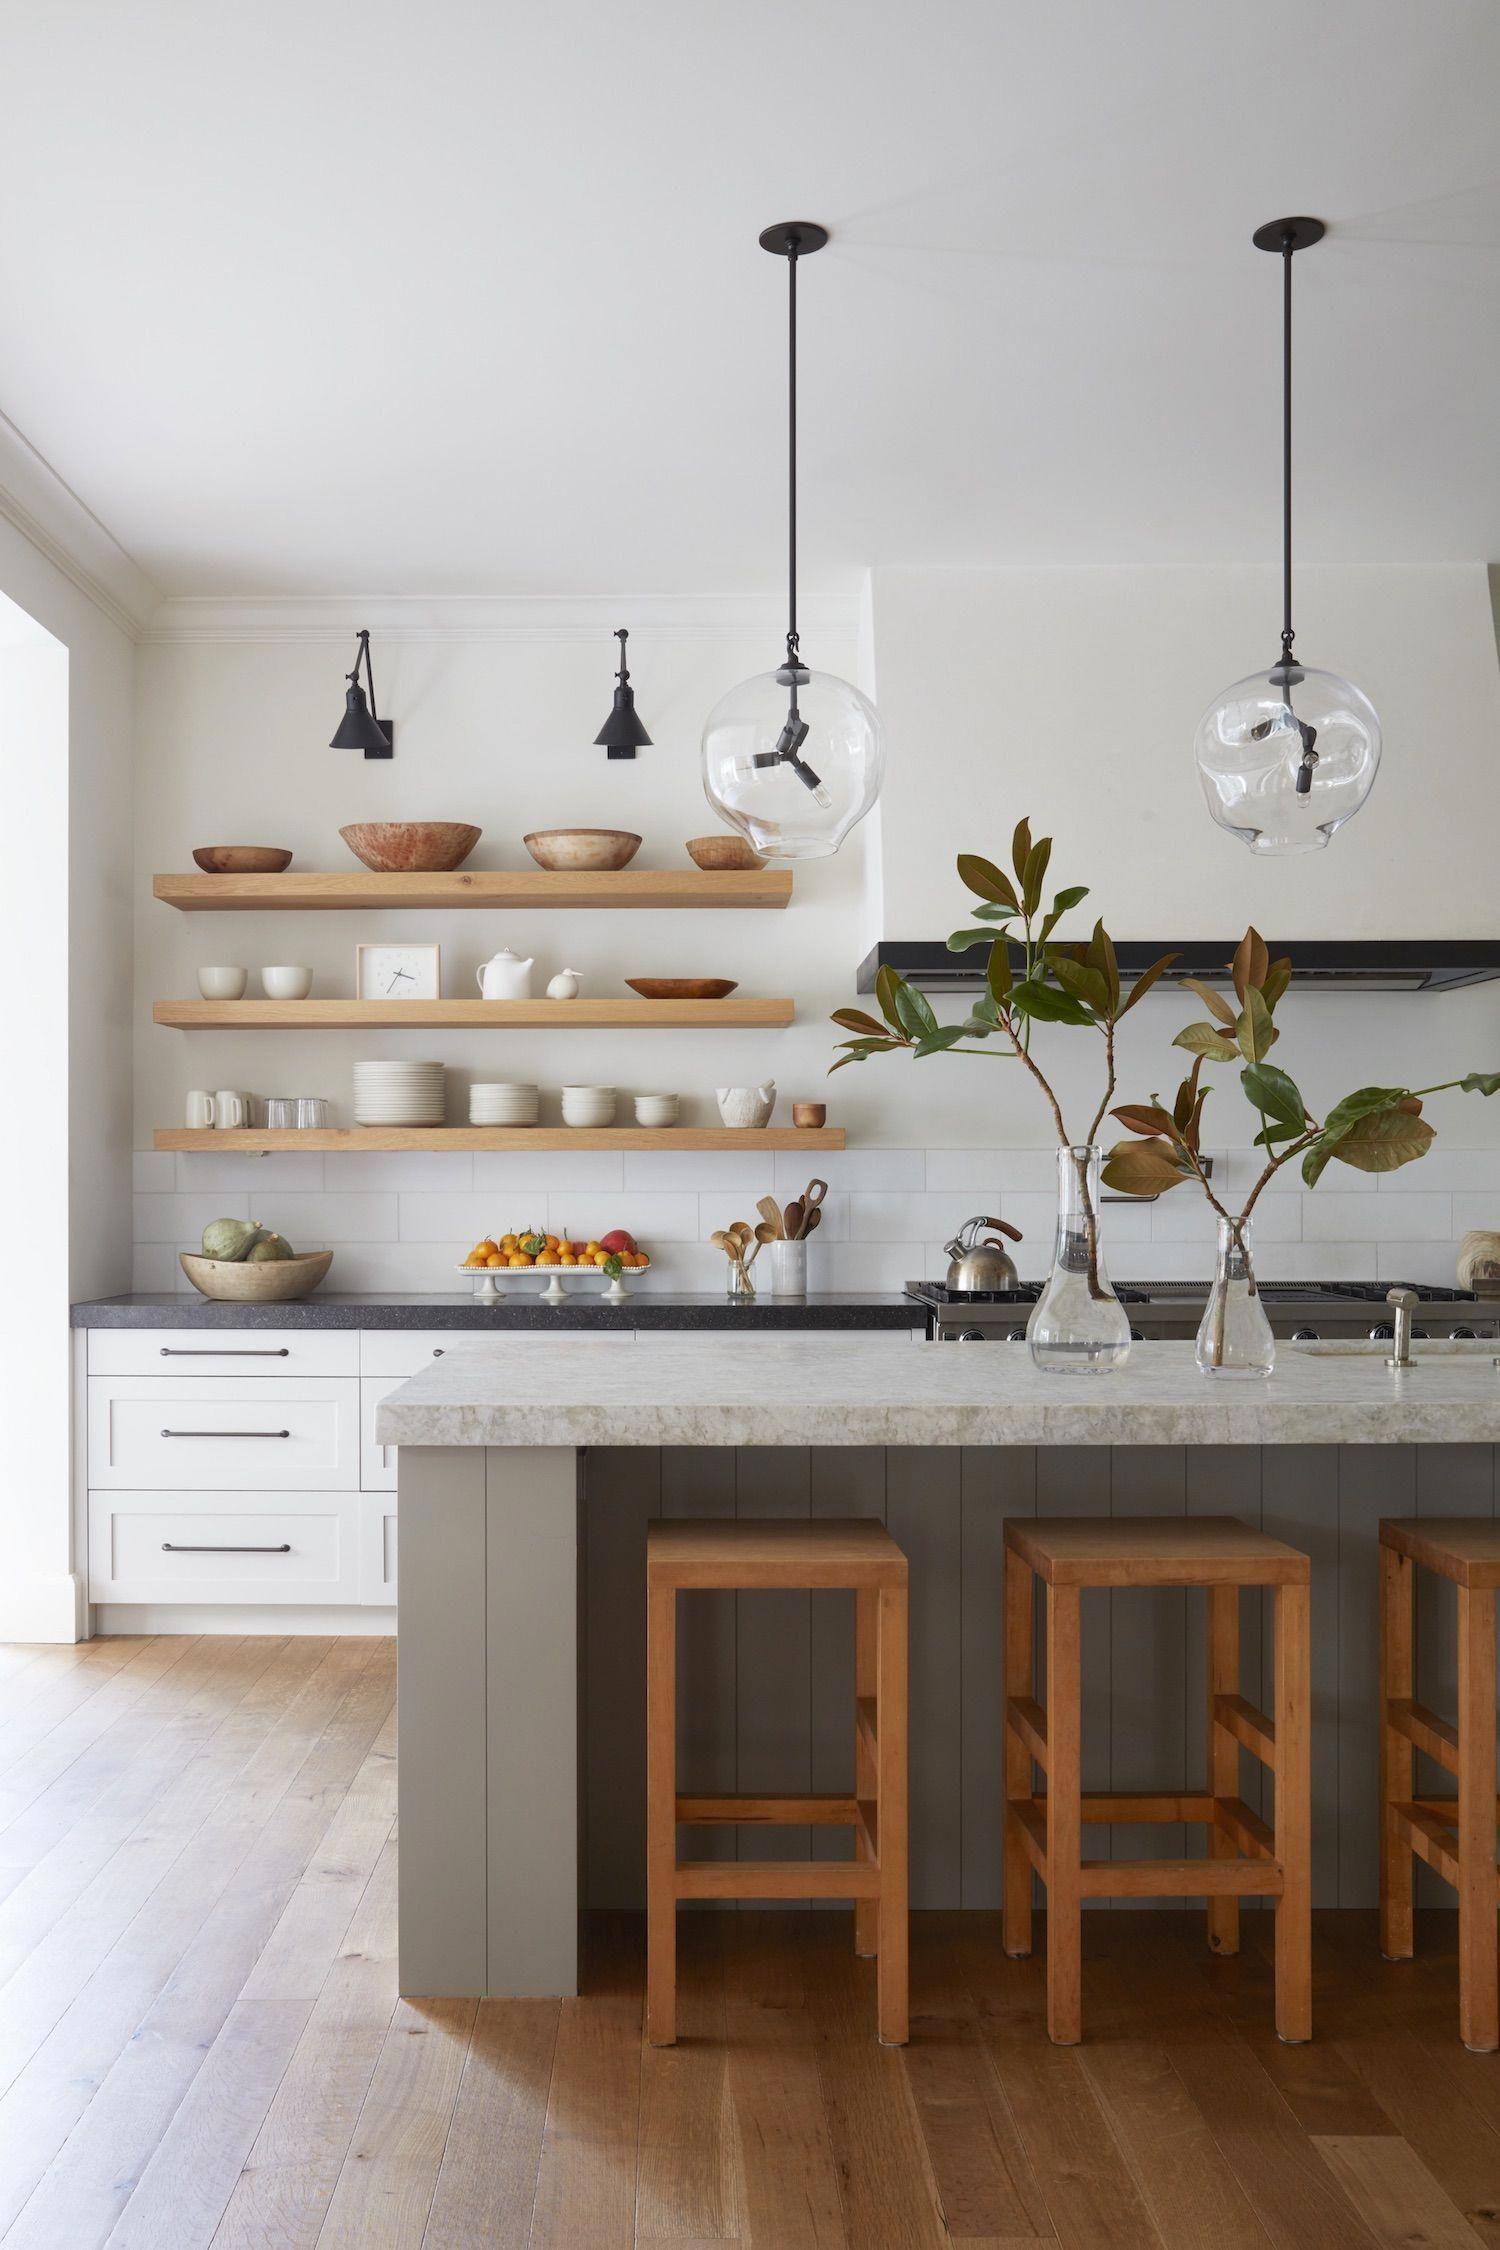 Color palette overall simplicity  elle design brentwood revival california interior firm moderninteriordesign also rh pinterest